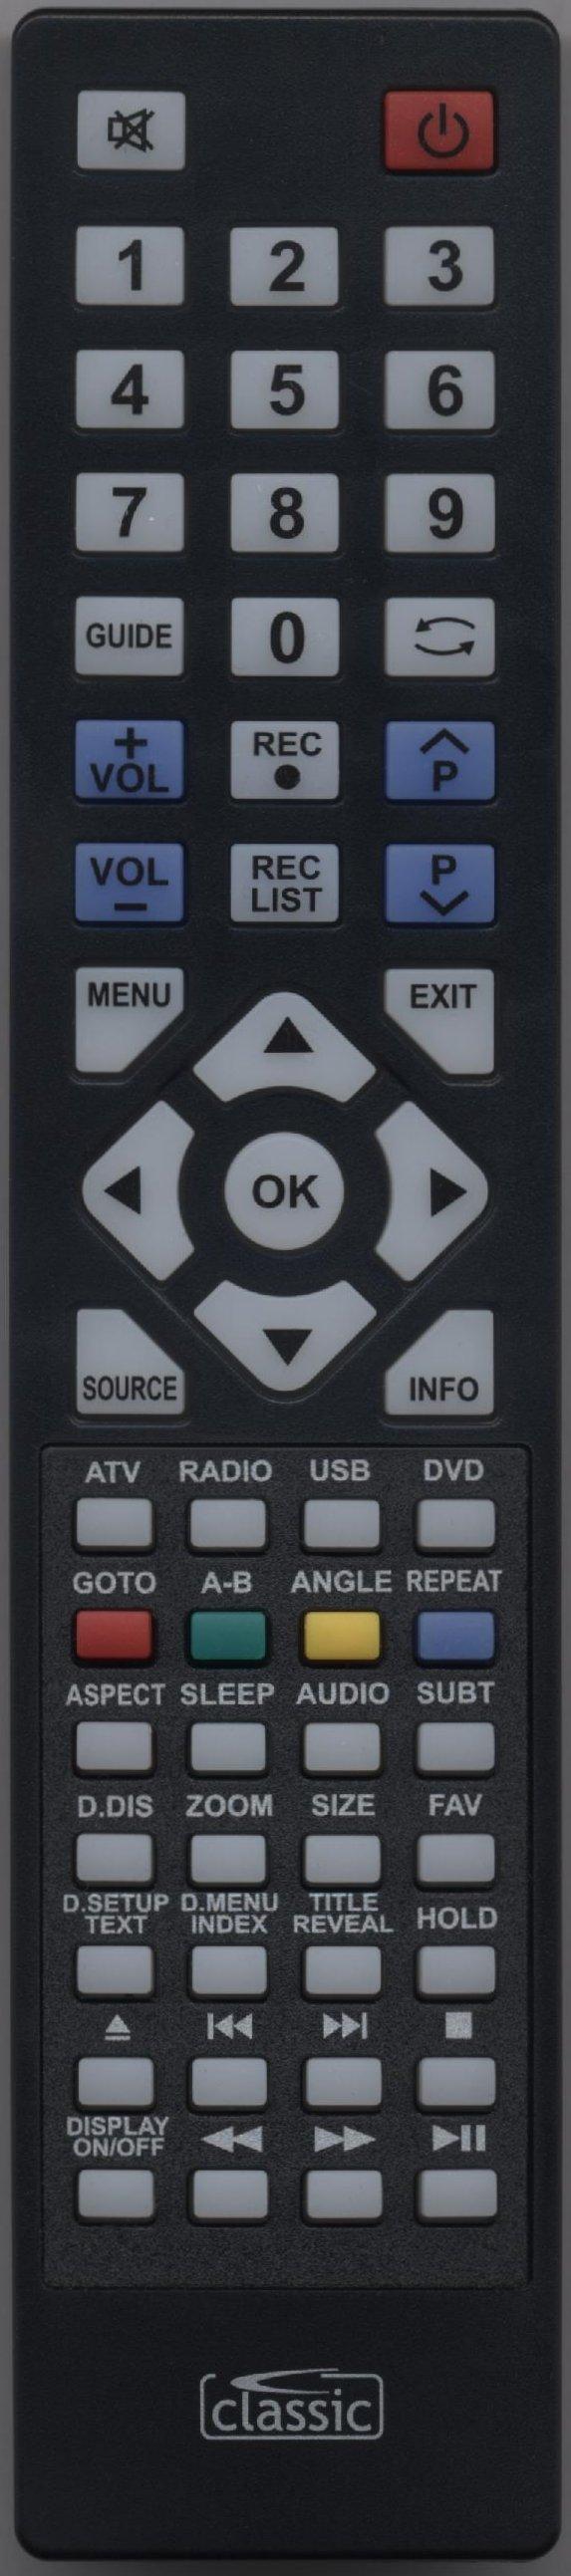 Blaupunkt W215194GHTFTCDUPUK Remote Control